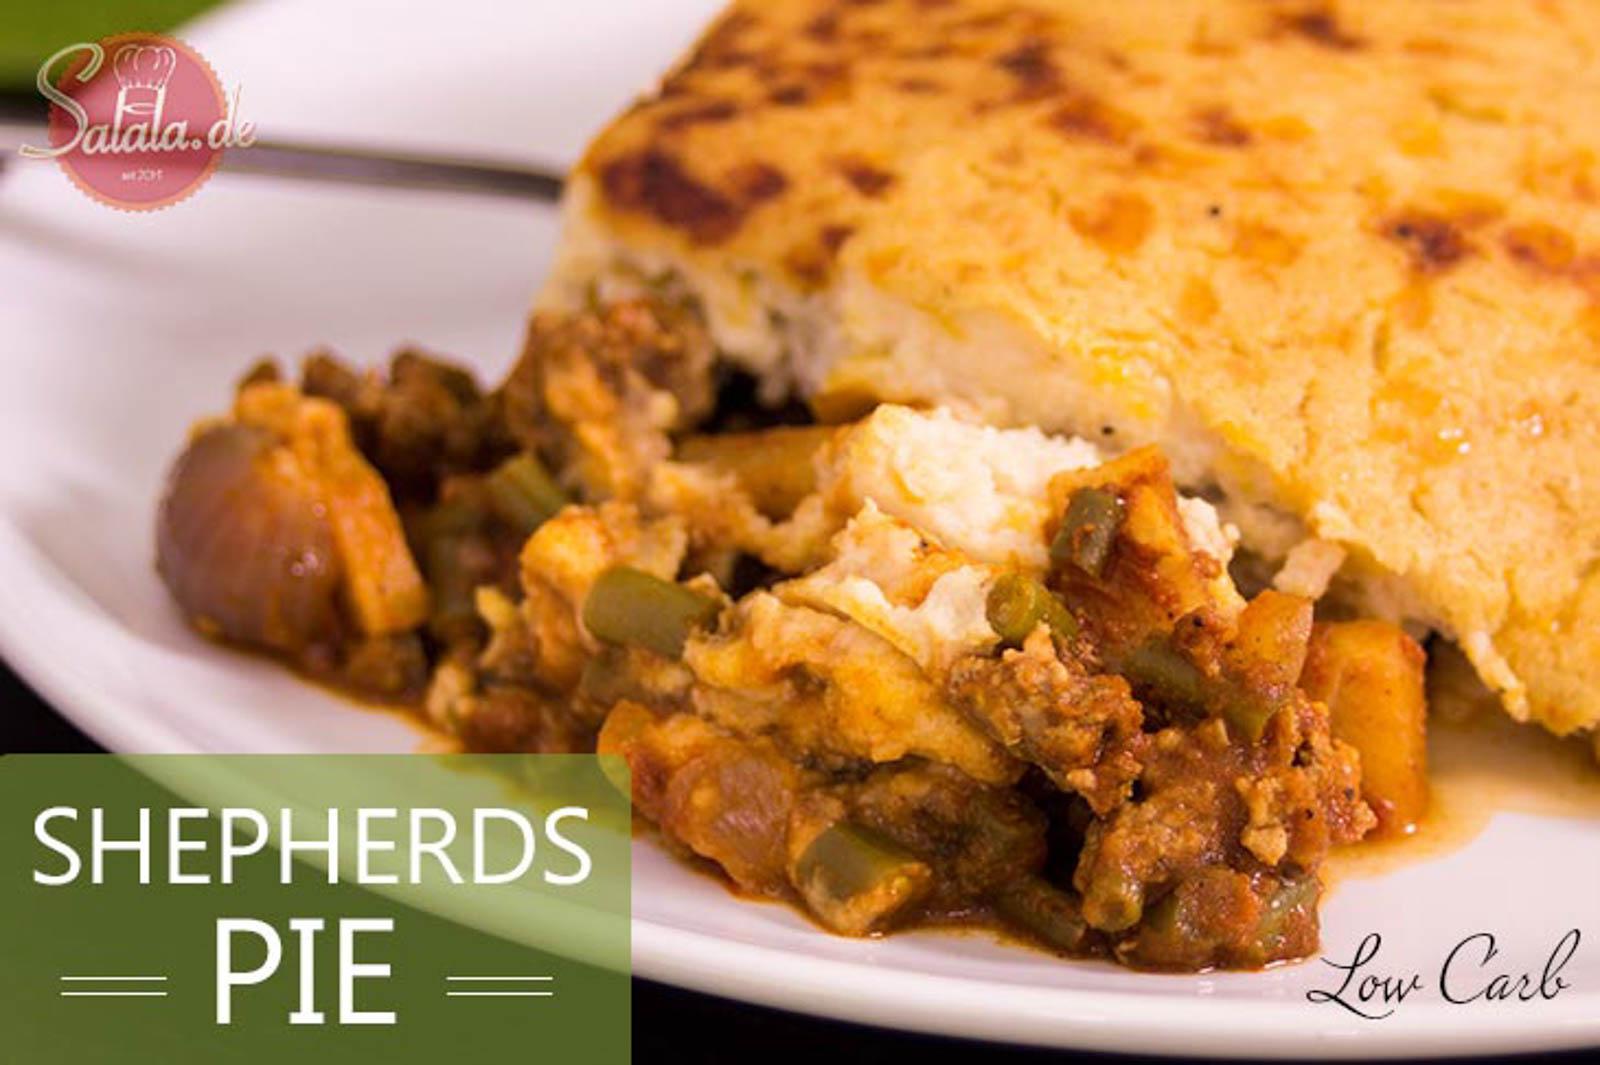 shepherds pie mit lammhack saint patricks day kartoffelbrei low carb glutenfrei salala.de